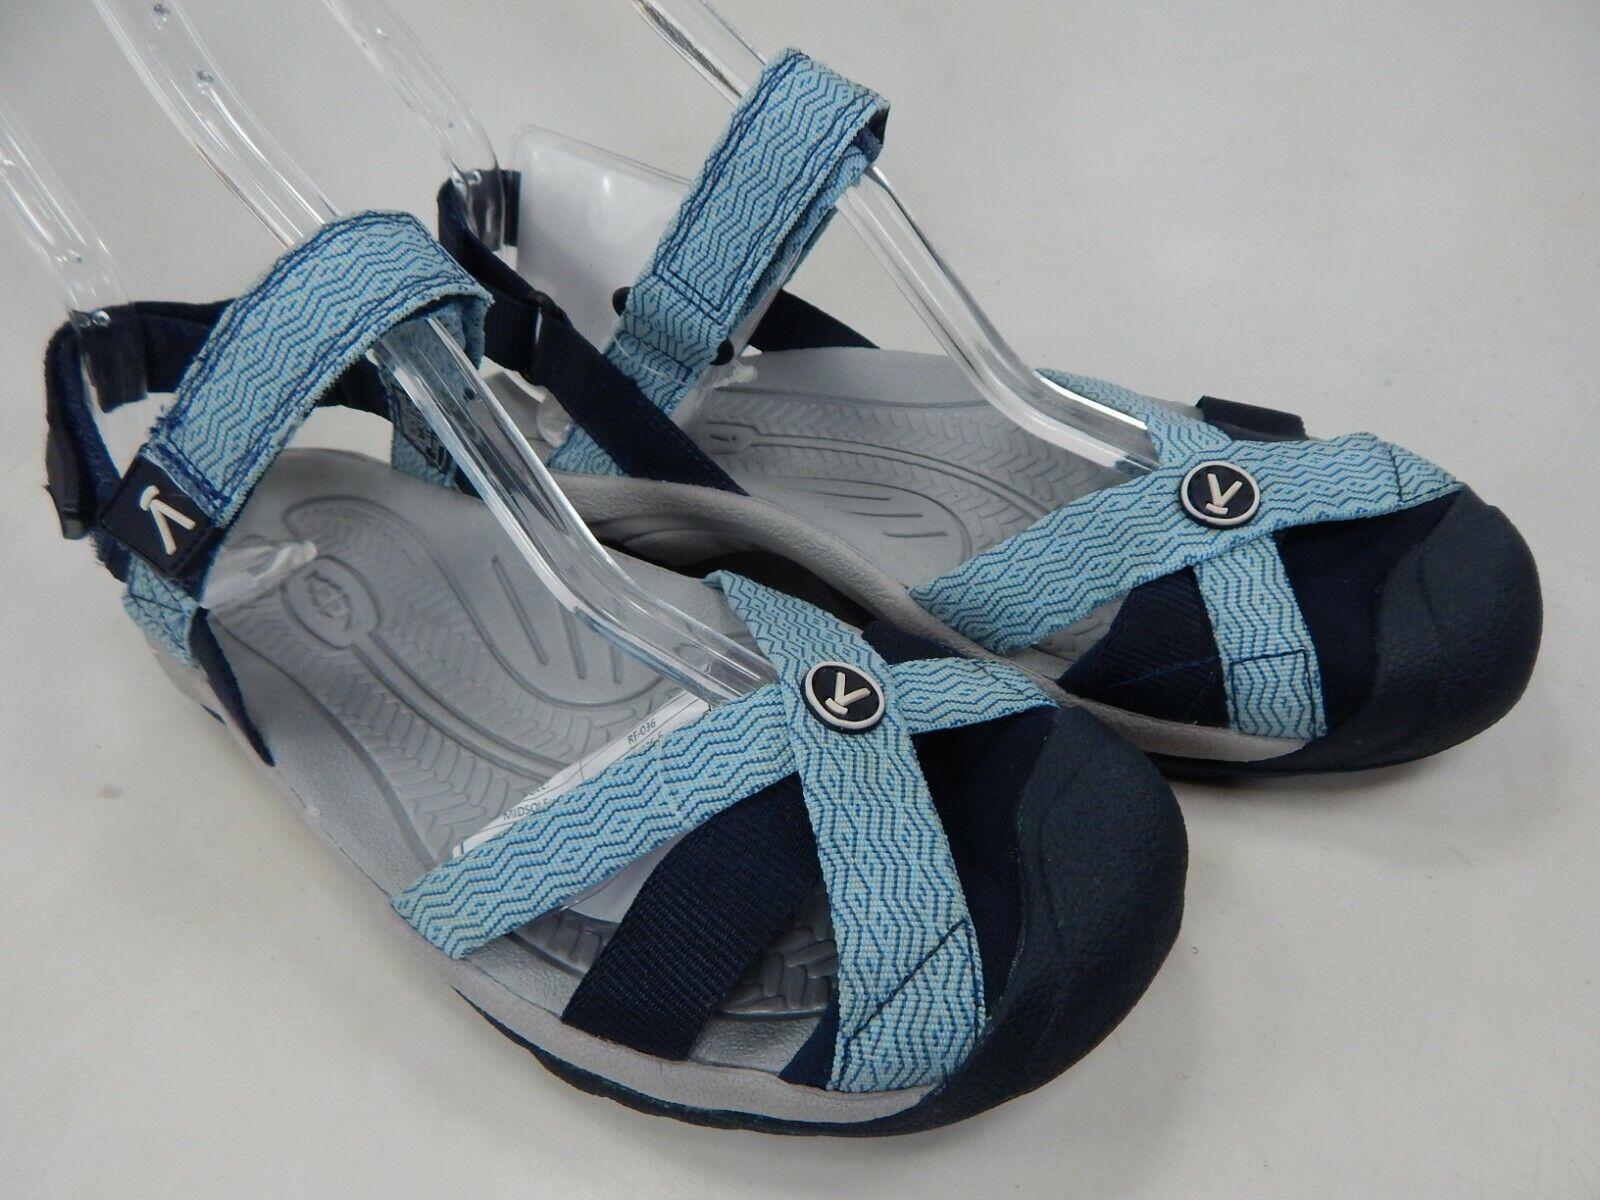 Keen Bali Strap Size US 7 M (B) EU 37.5 Women's Sport Sandals shoes Dress bluee